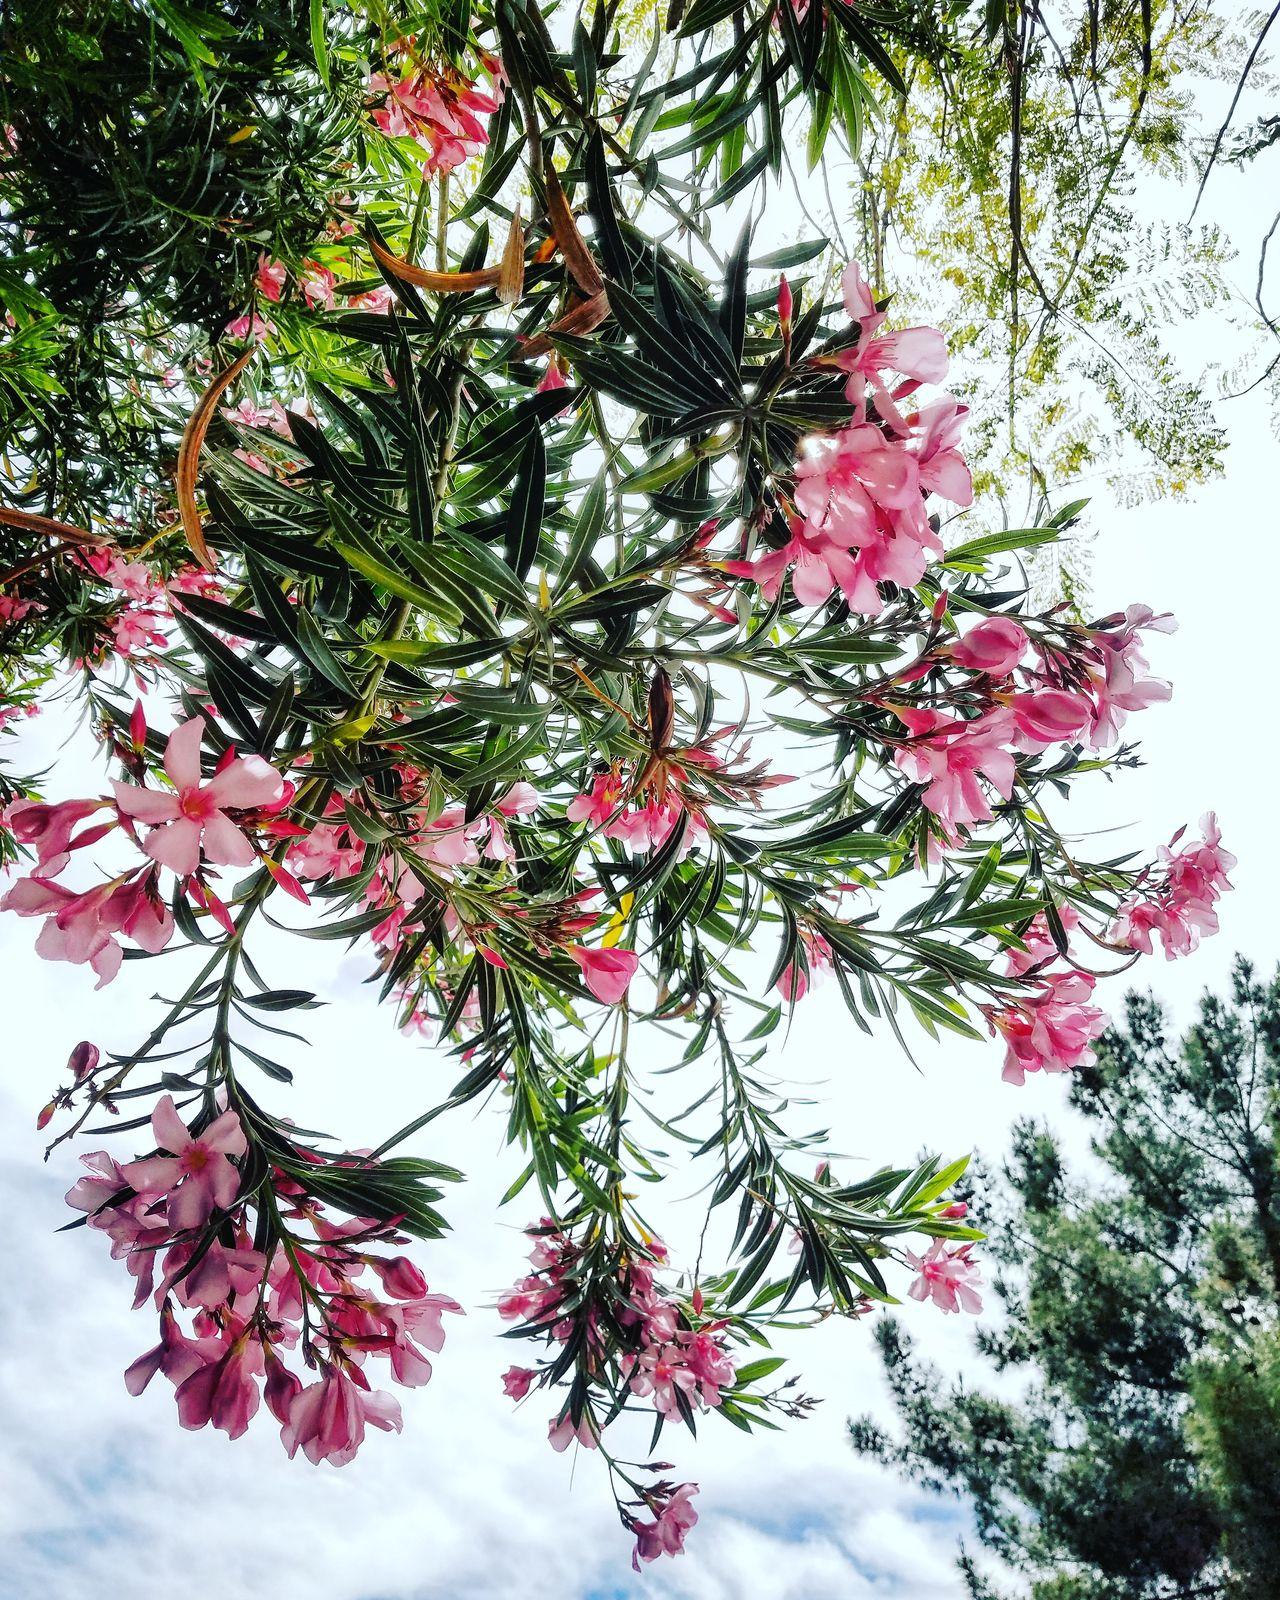 Tree Nature Growth Flower Beauty In Nature Low Angle View Sky BestofEyeEm EyeEm Masterclass EyeEmBestEdits EyeEm Best Shots BestEyeemShots Premium Collection EyeEm Vision